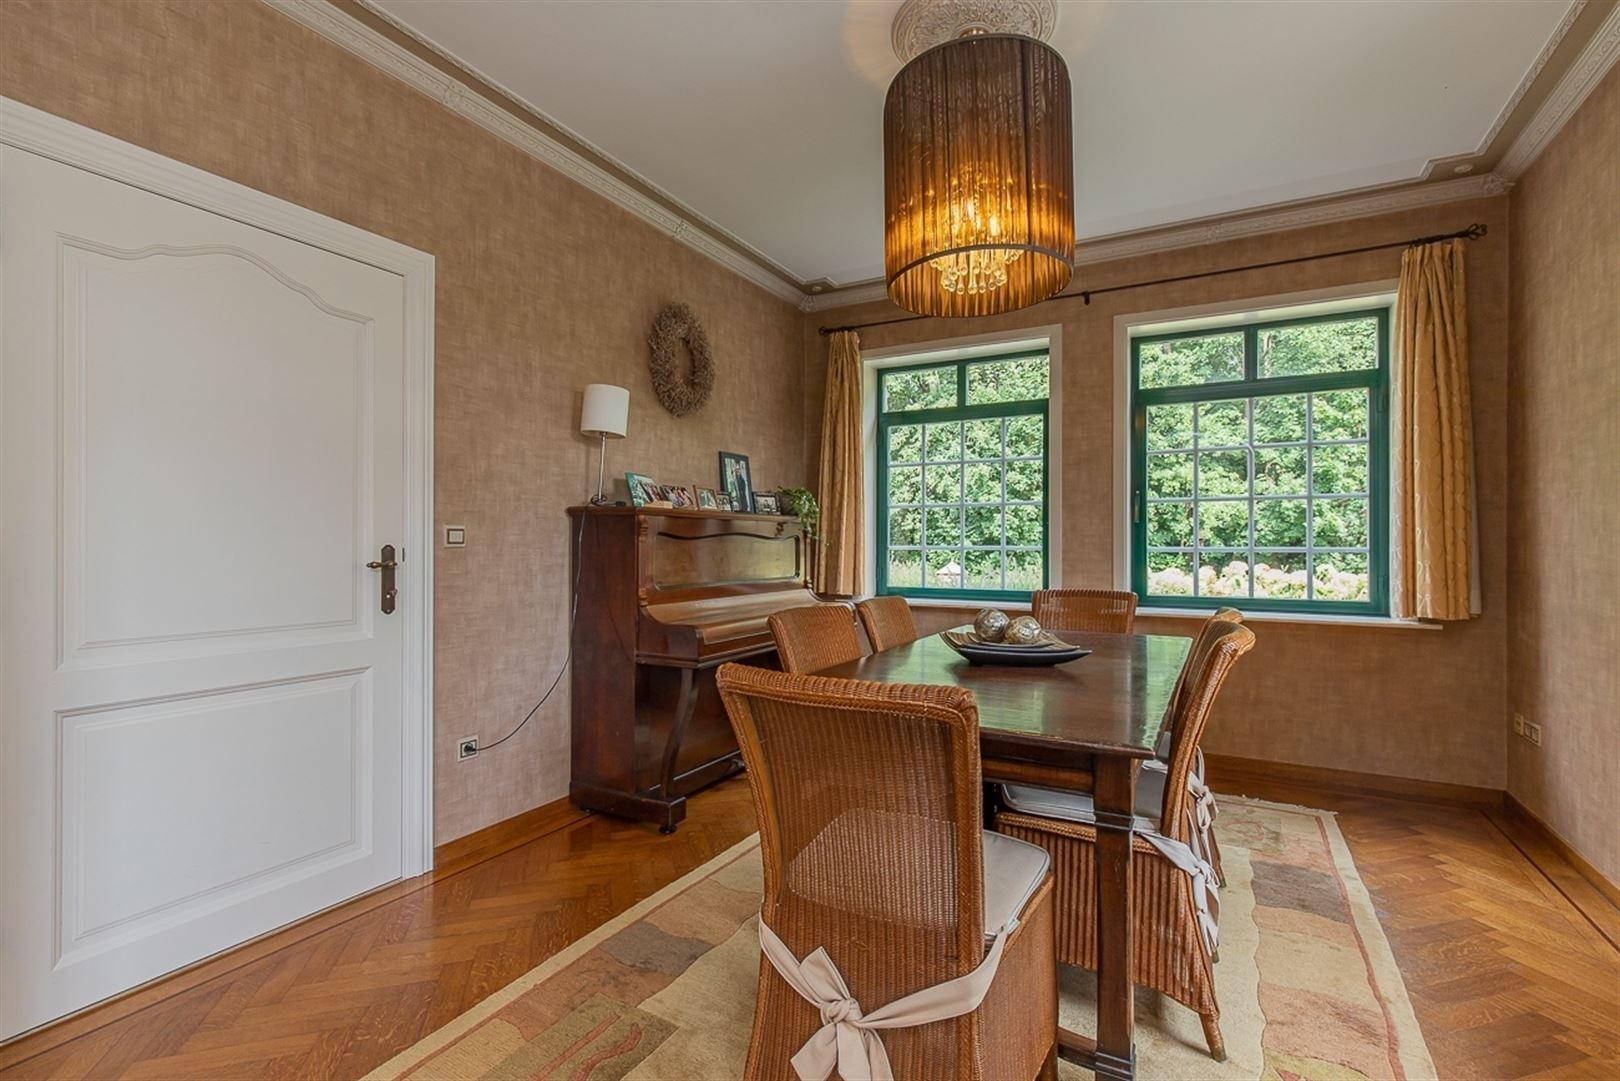 Foto 9 : Woning te 9280 LEBBEKE (België) - Prijs € 469.000